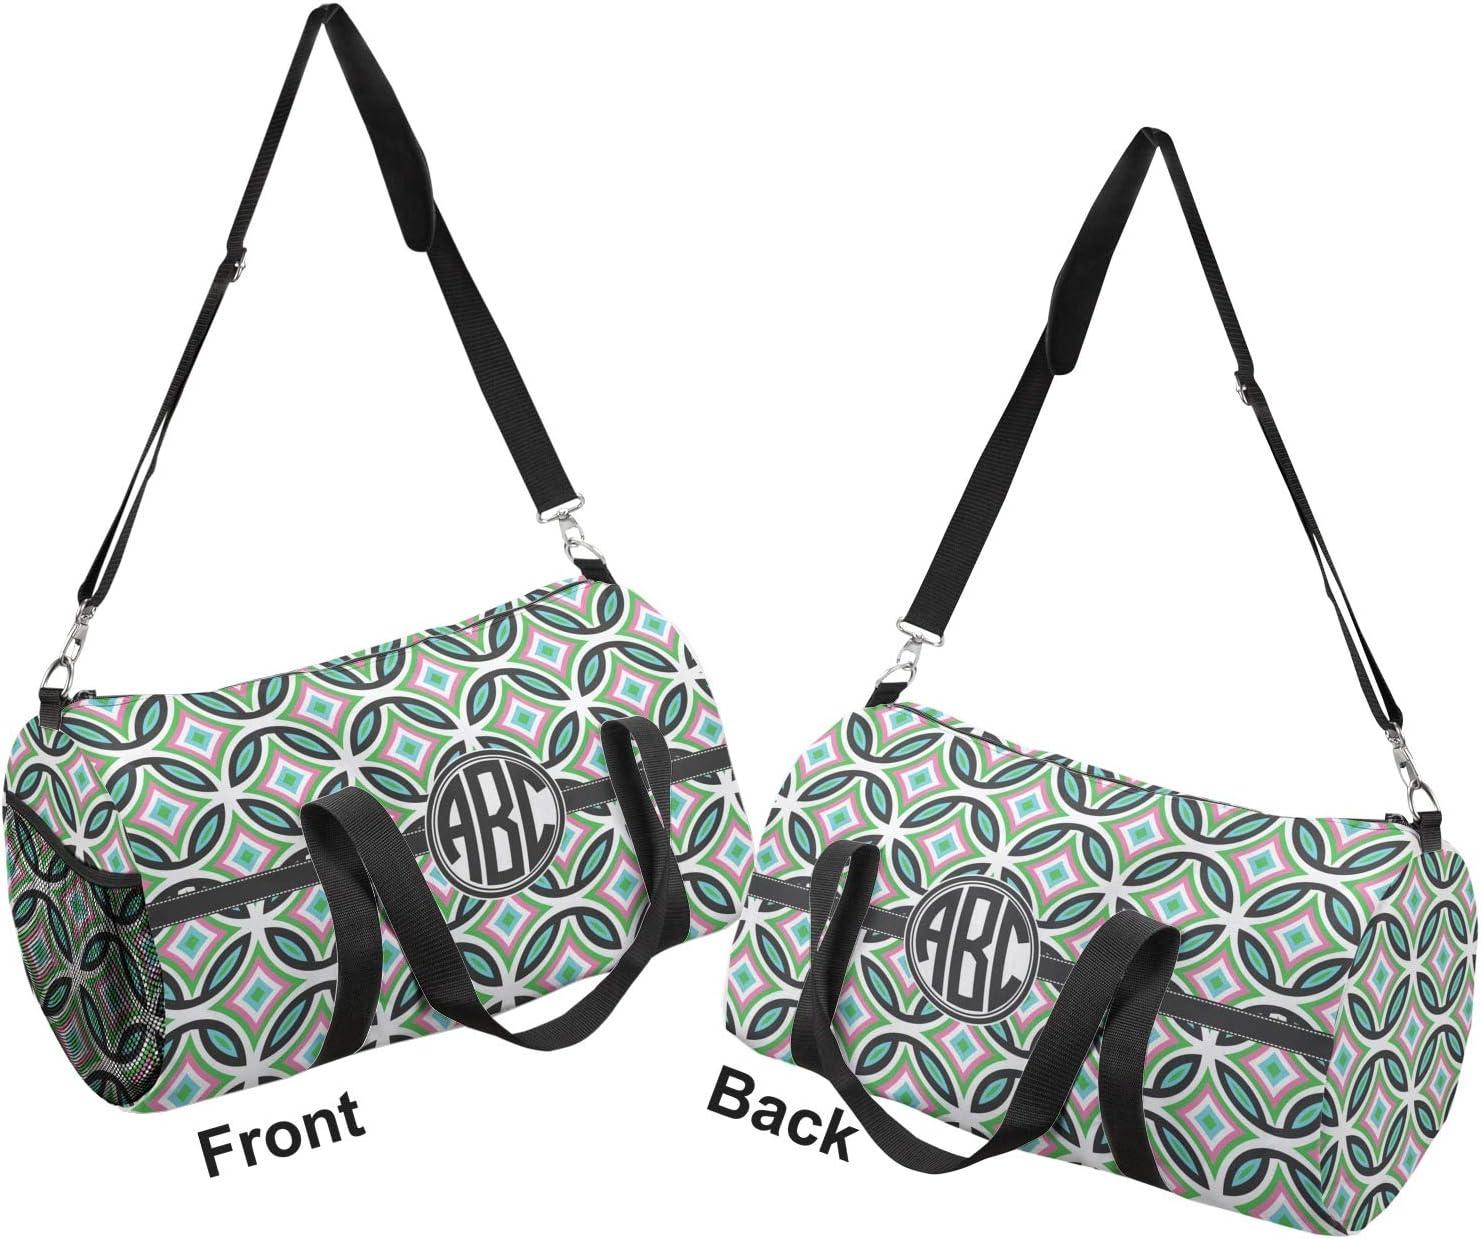 YouCustomizeIt Geometric Circles Duffel Bag Personalized